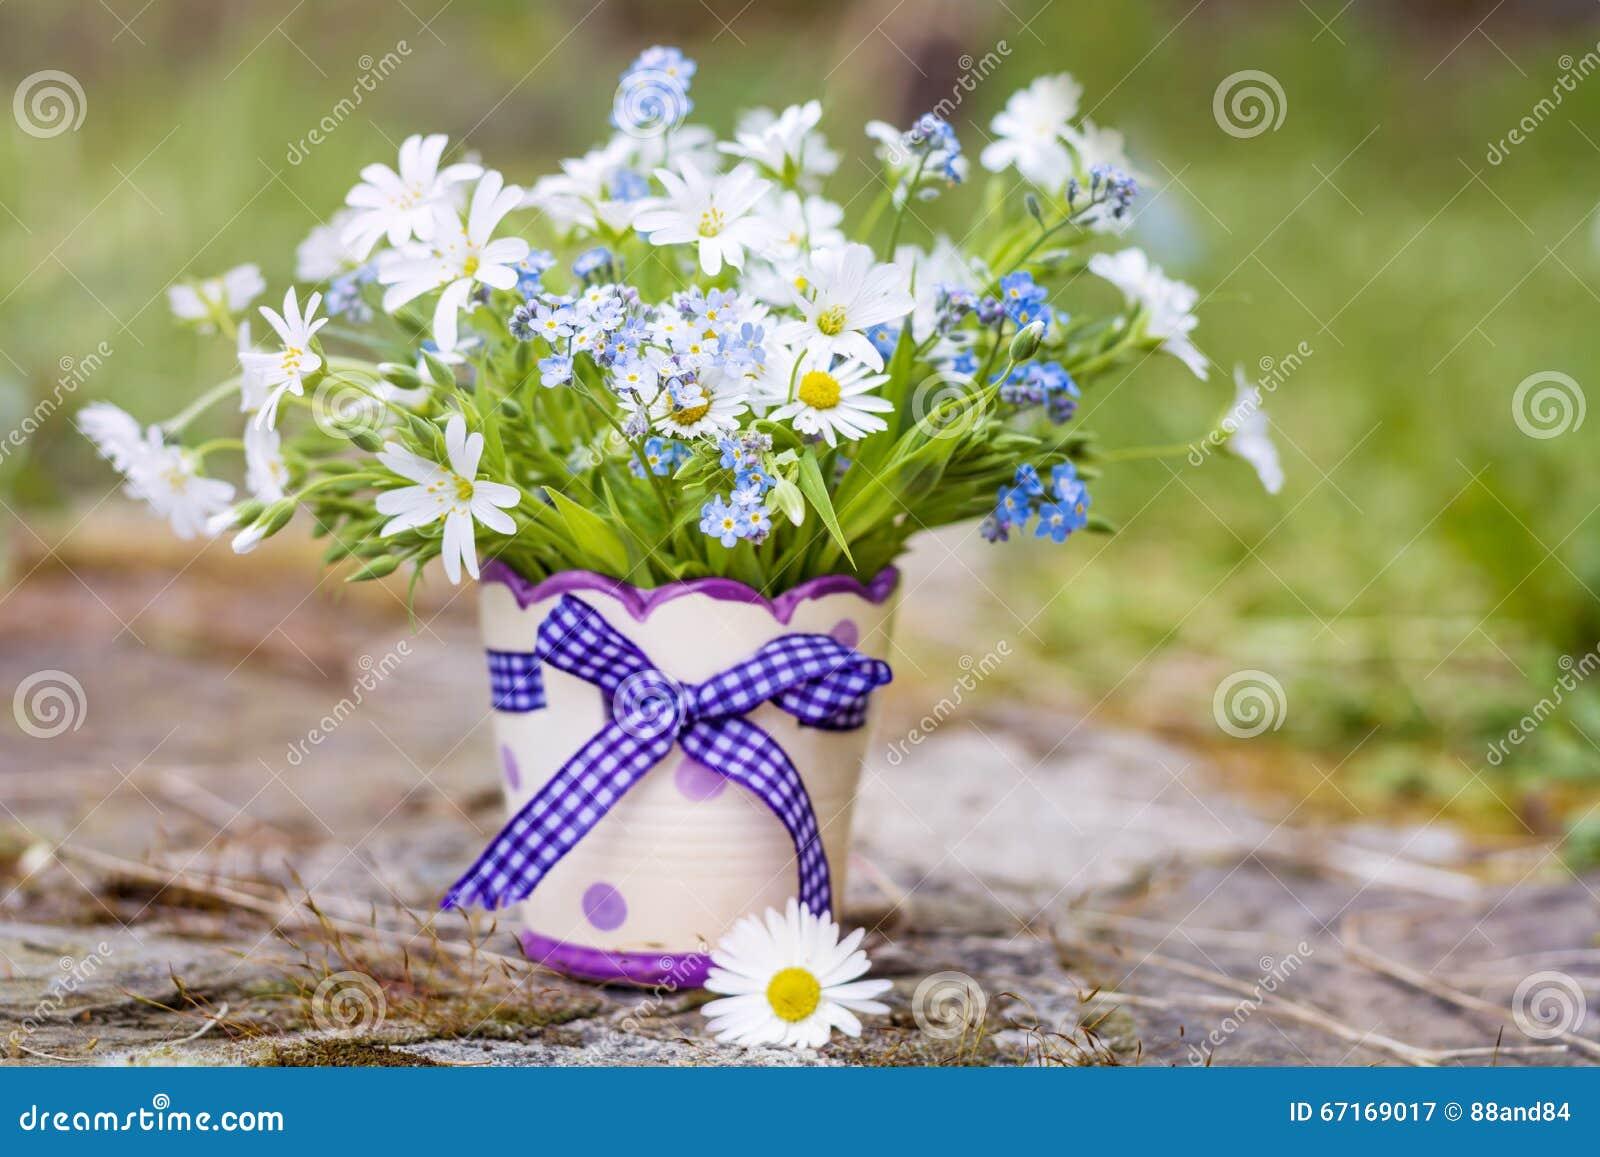 Beautiful daisy flowers in small decorative vase stock image image royalty free stock photo download beautiful daisy flowers in small decorative vase stock image izmirmasajfo Choice Image